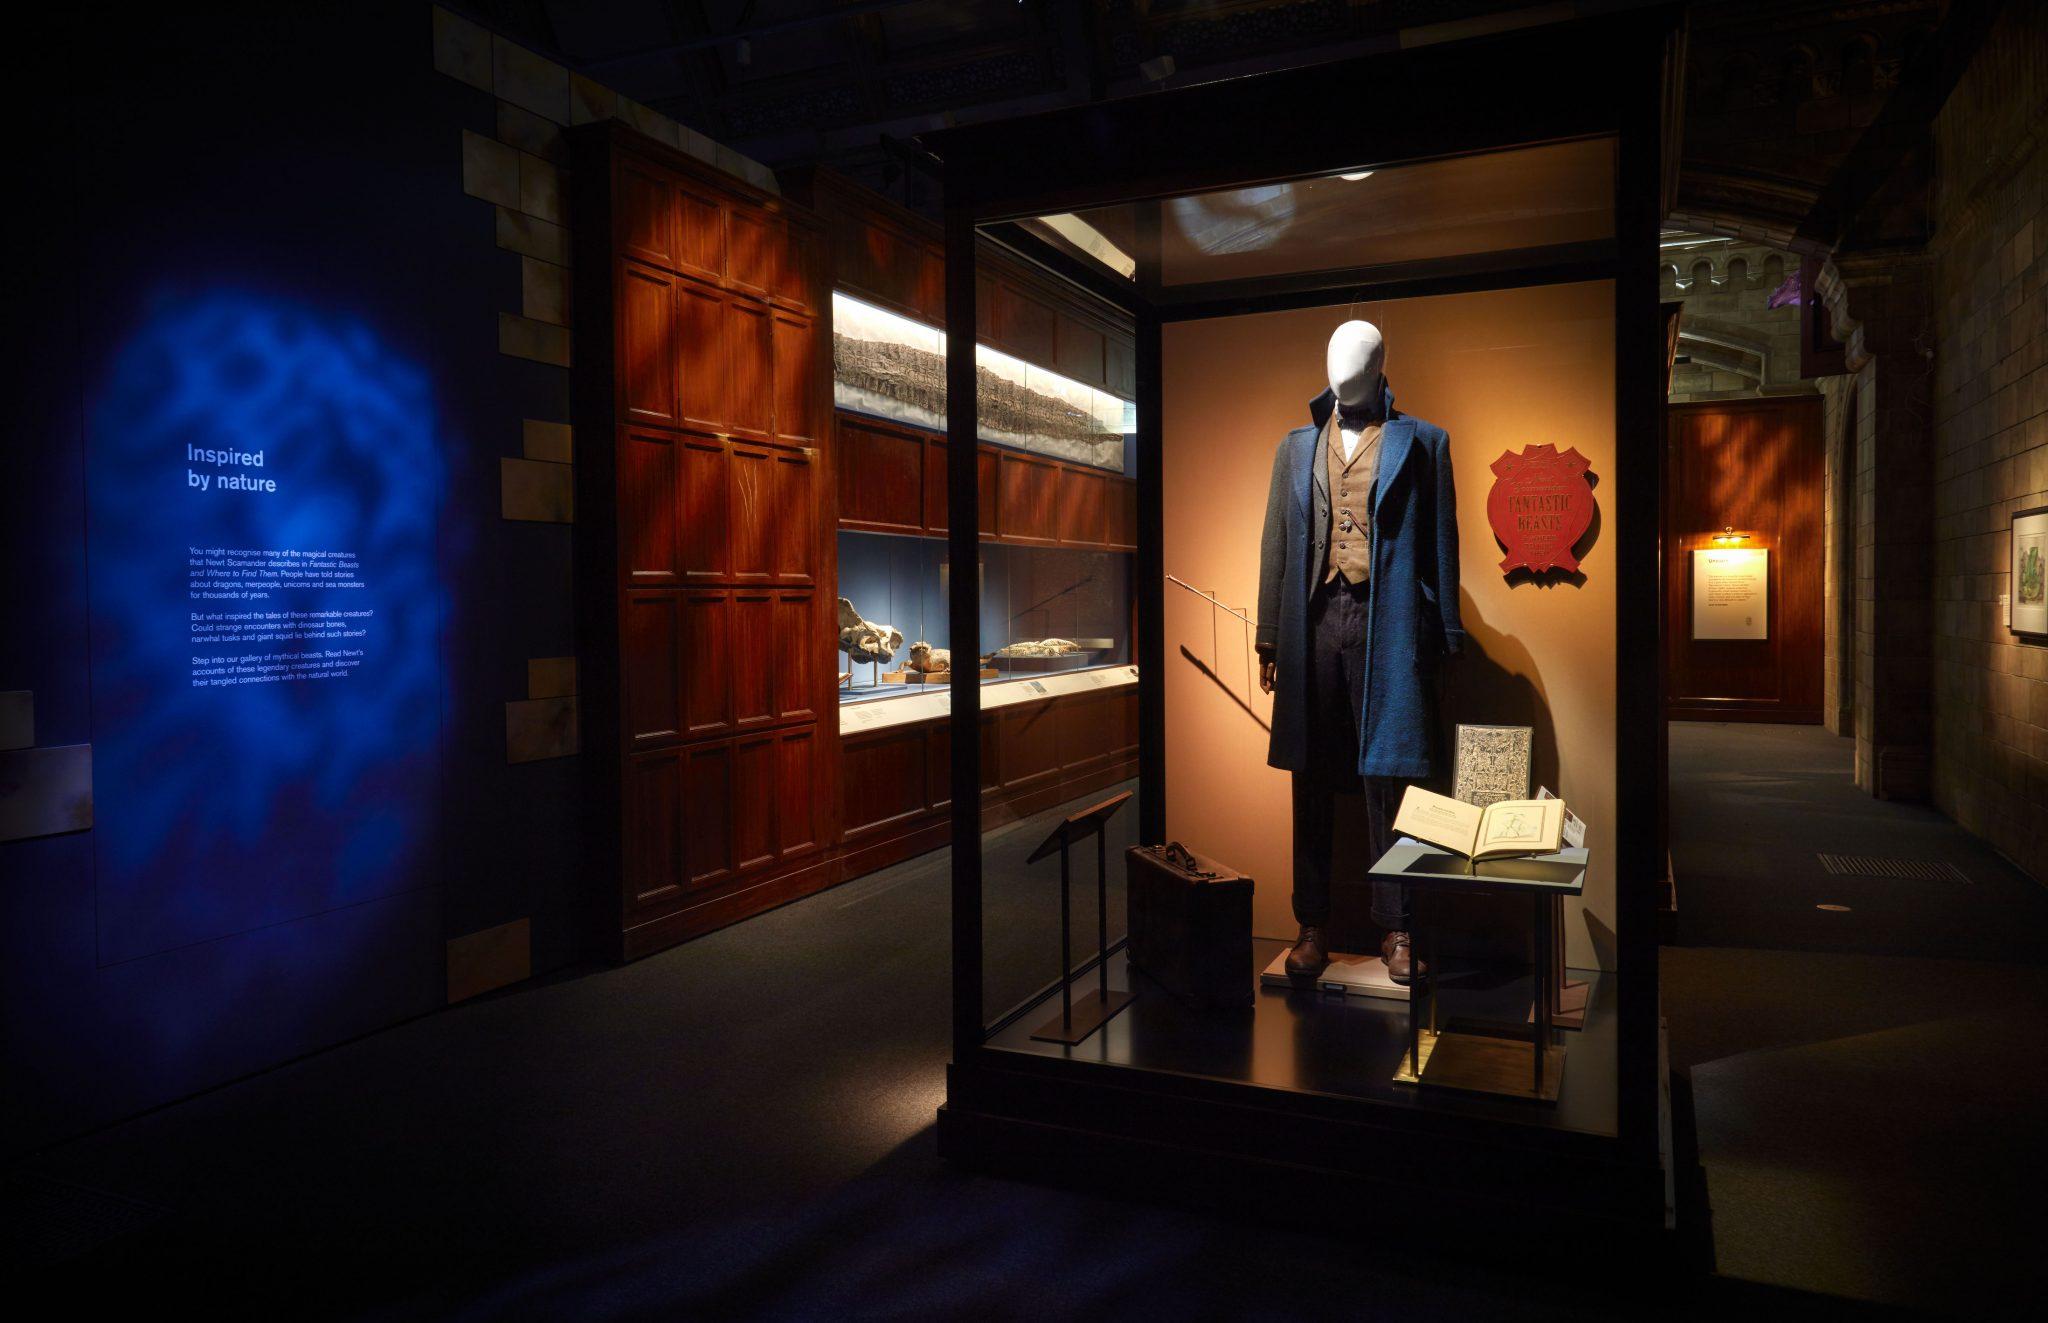 Fantastic Beasts Newt Scamander at the Natural History Museum